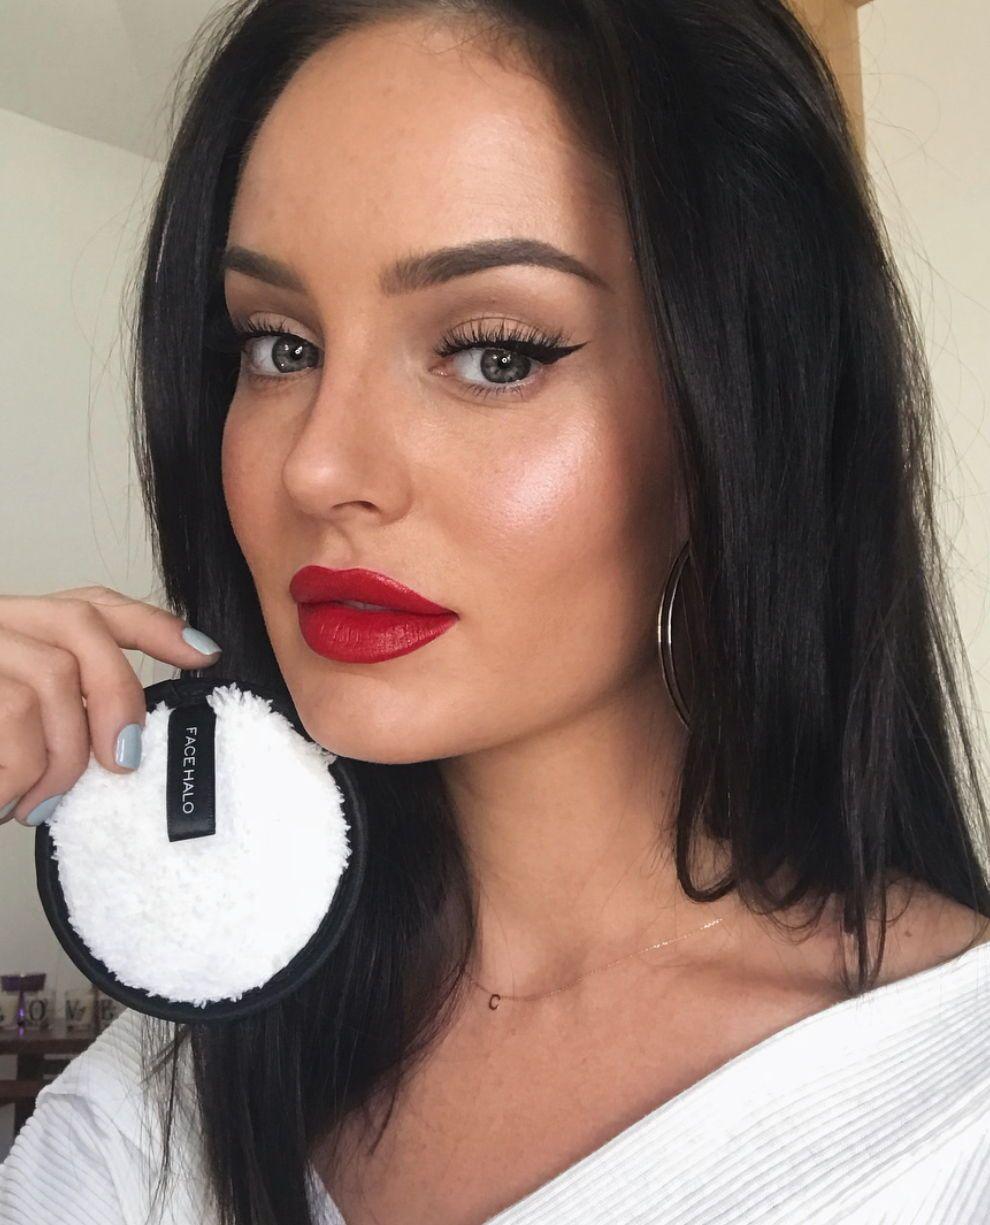 Chloe Morello Red Glossy Lipstick Makeup Makeup Eyeshadow Brown